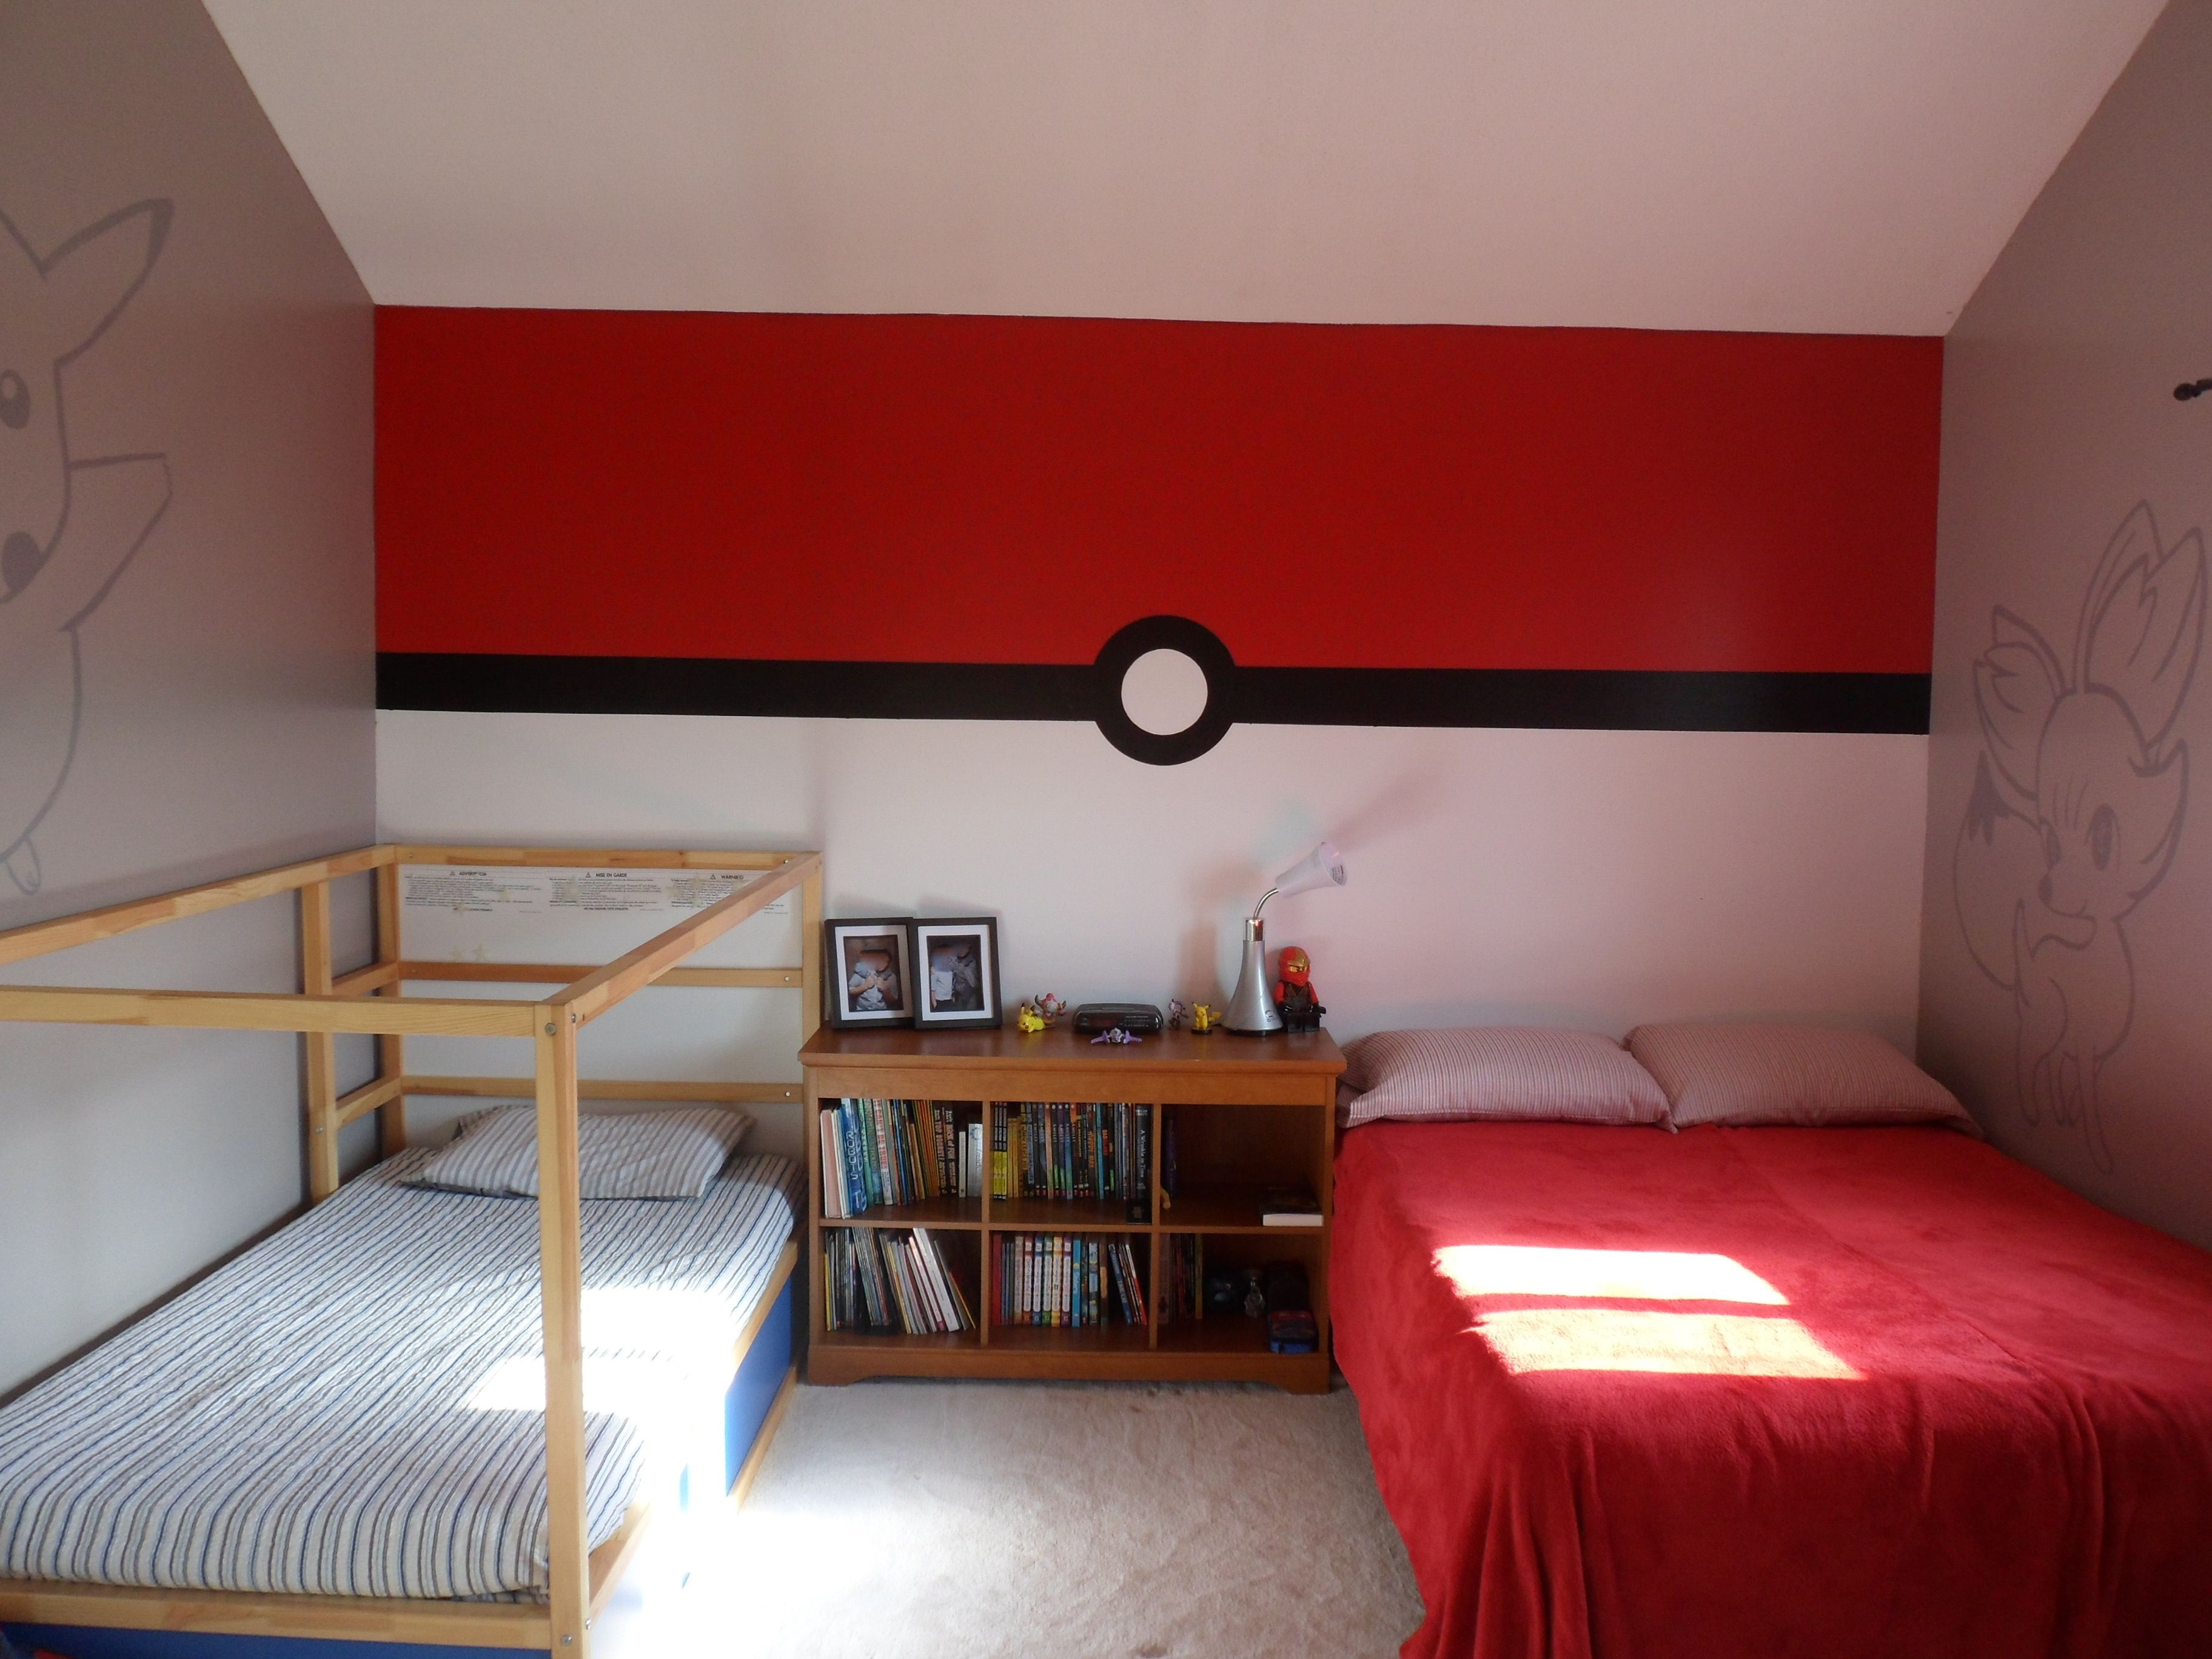 Pokemon Bedroom - Pokeball wall | Shared Bedrooms | Pinterest ...